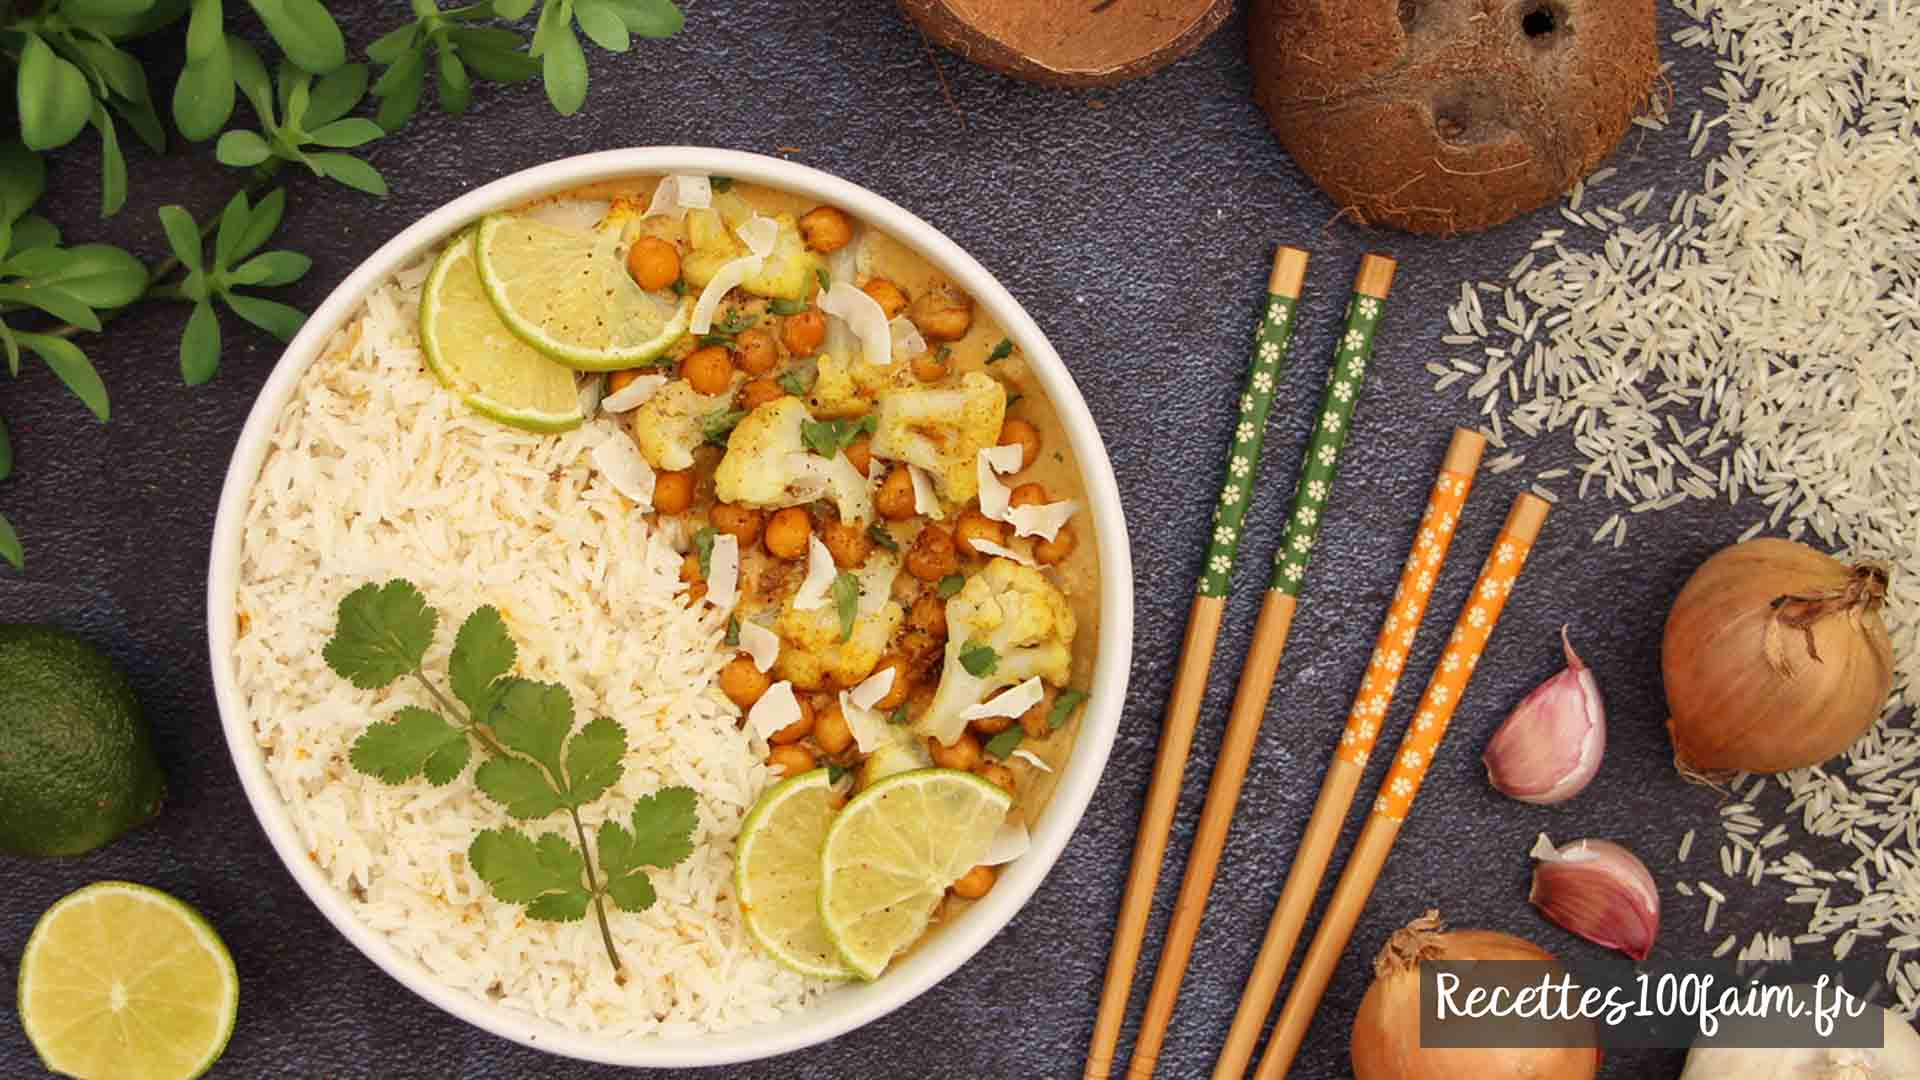 recette curry chou fleur pois chiches coco